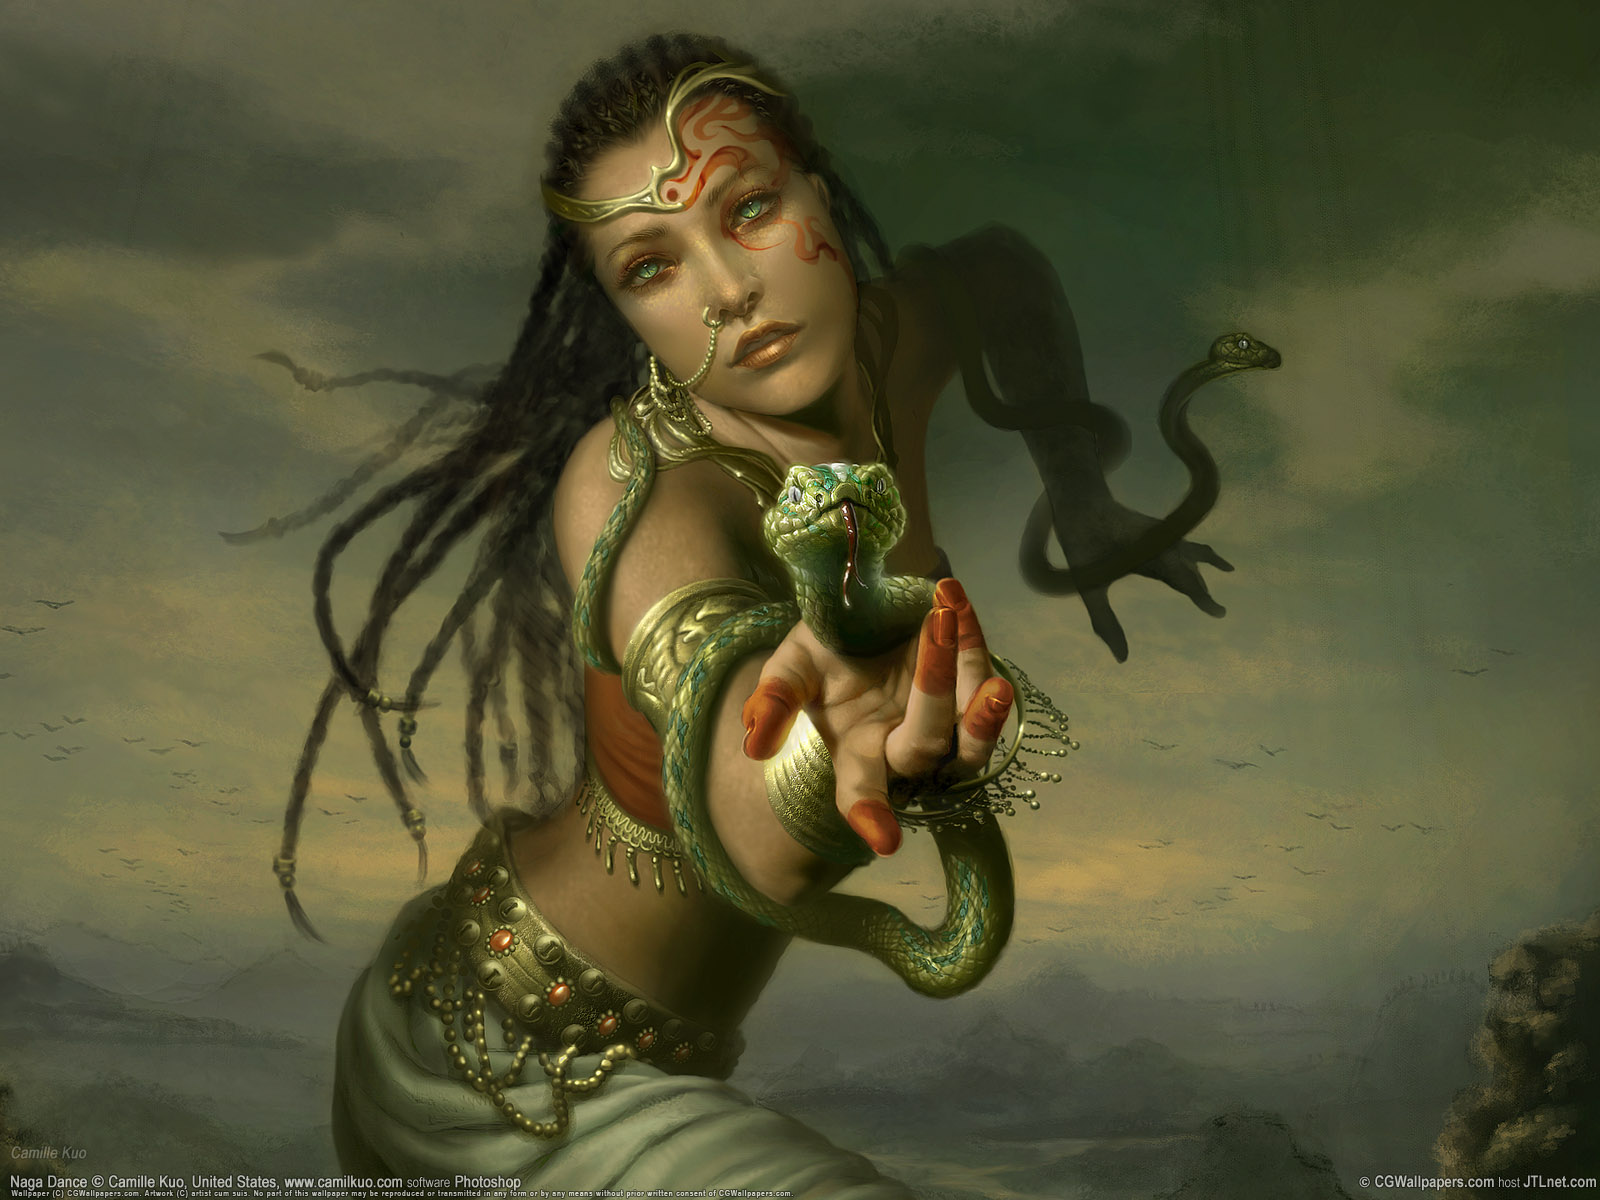 Naga snake woman porn nude daughters